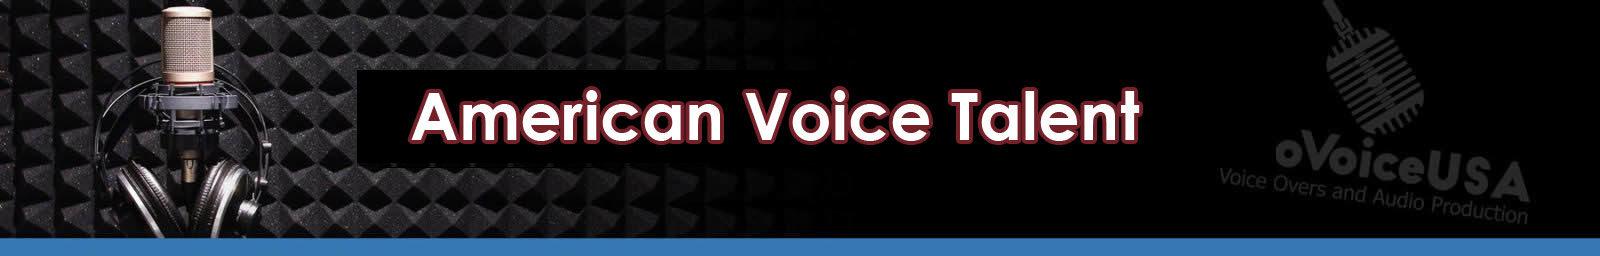 American Voice Talent